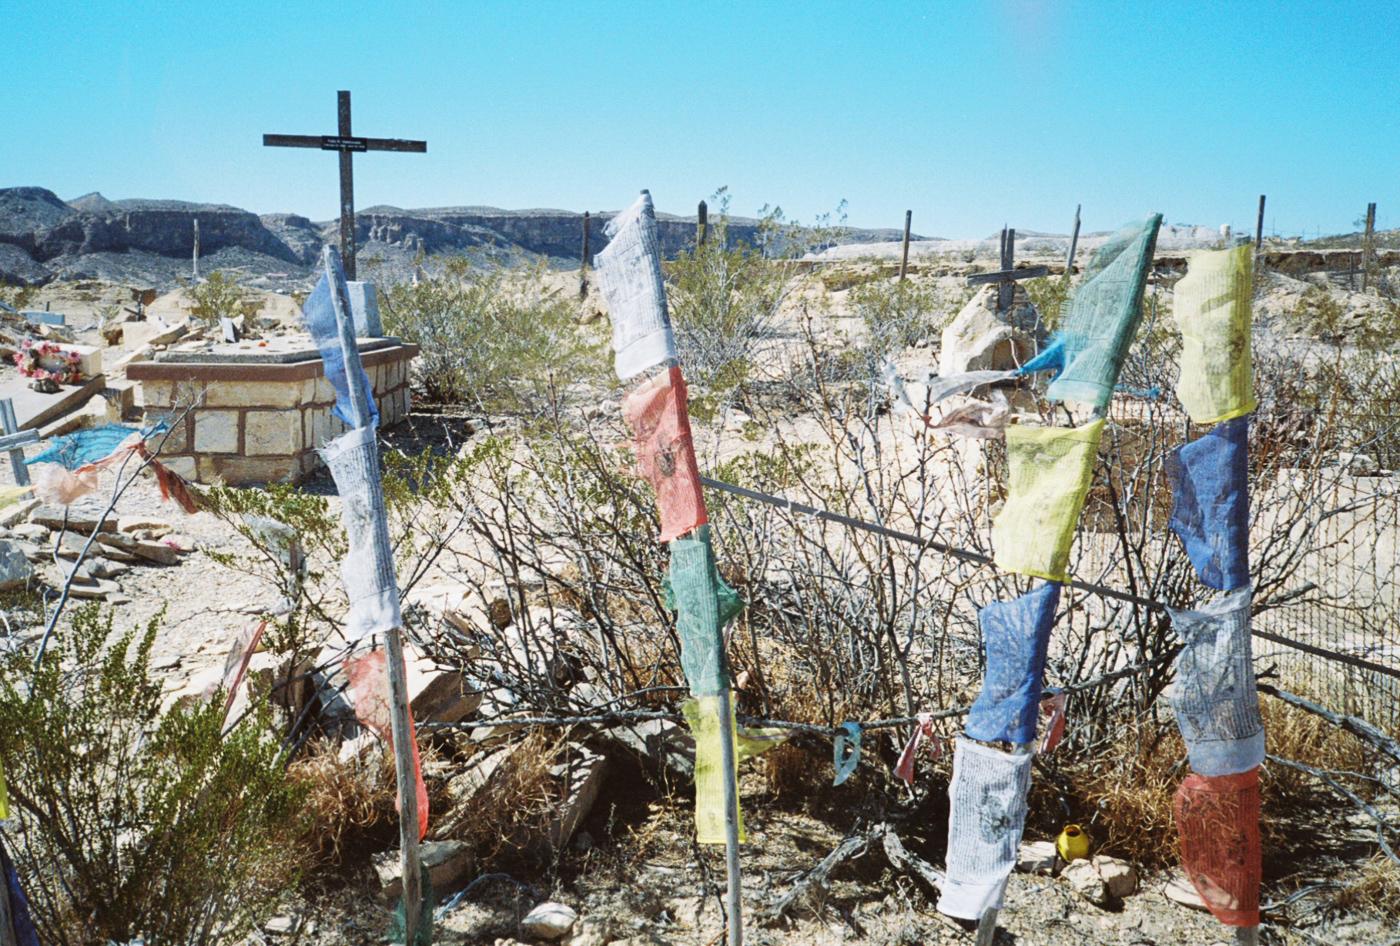 film 35mm lomo olympus hike camp big bend texas america yall pawlowski terlingua